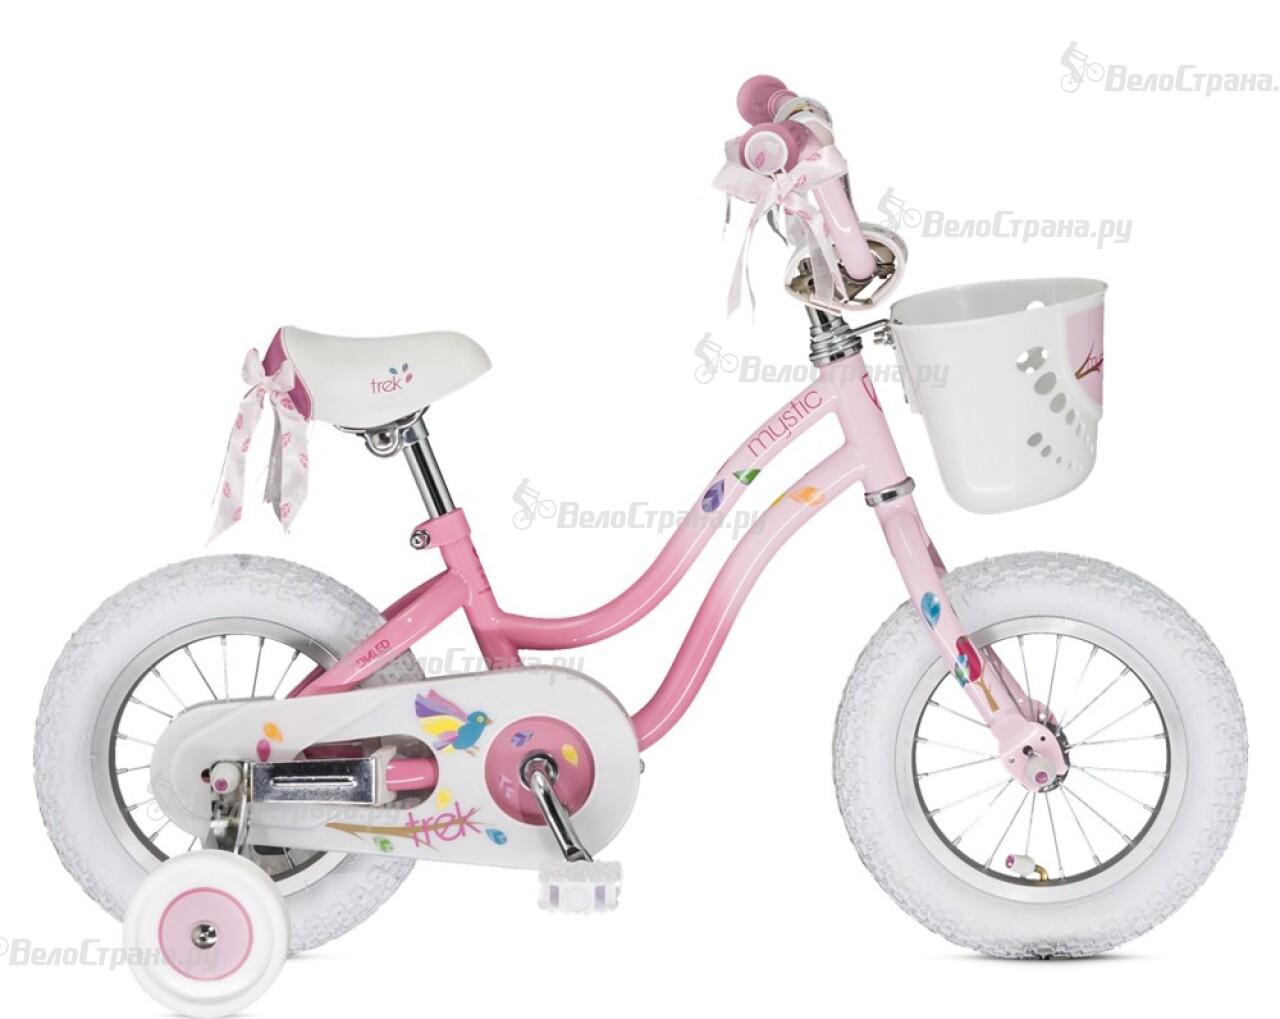 цена на Велосипед Trek Mystic 12 (2014)